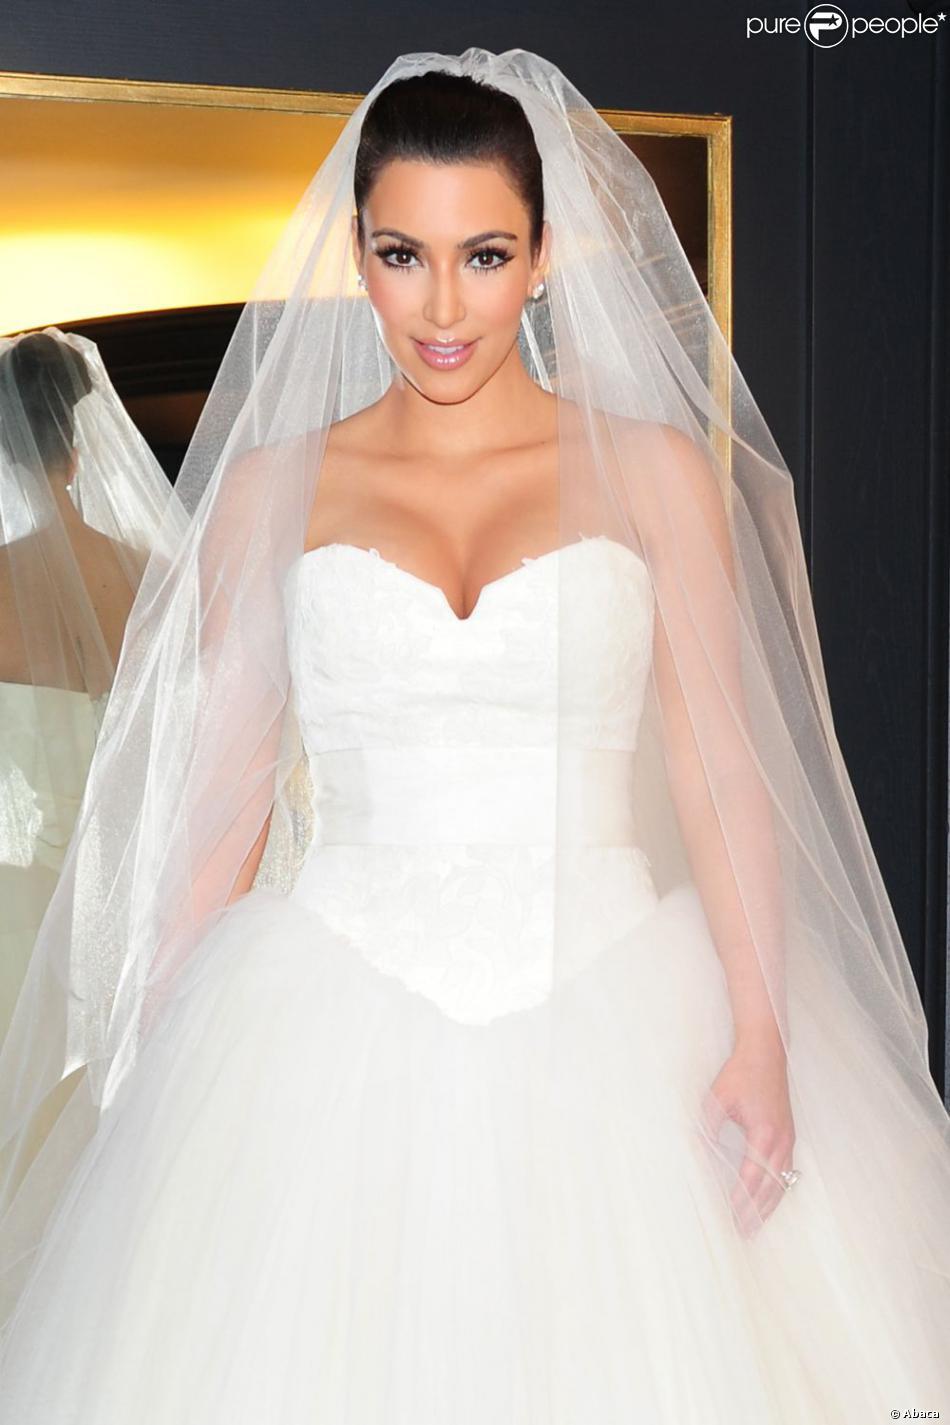 kim kardashian et sa robe de mari e vera wang new york